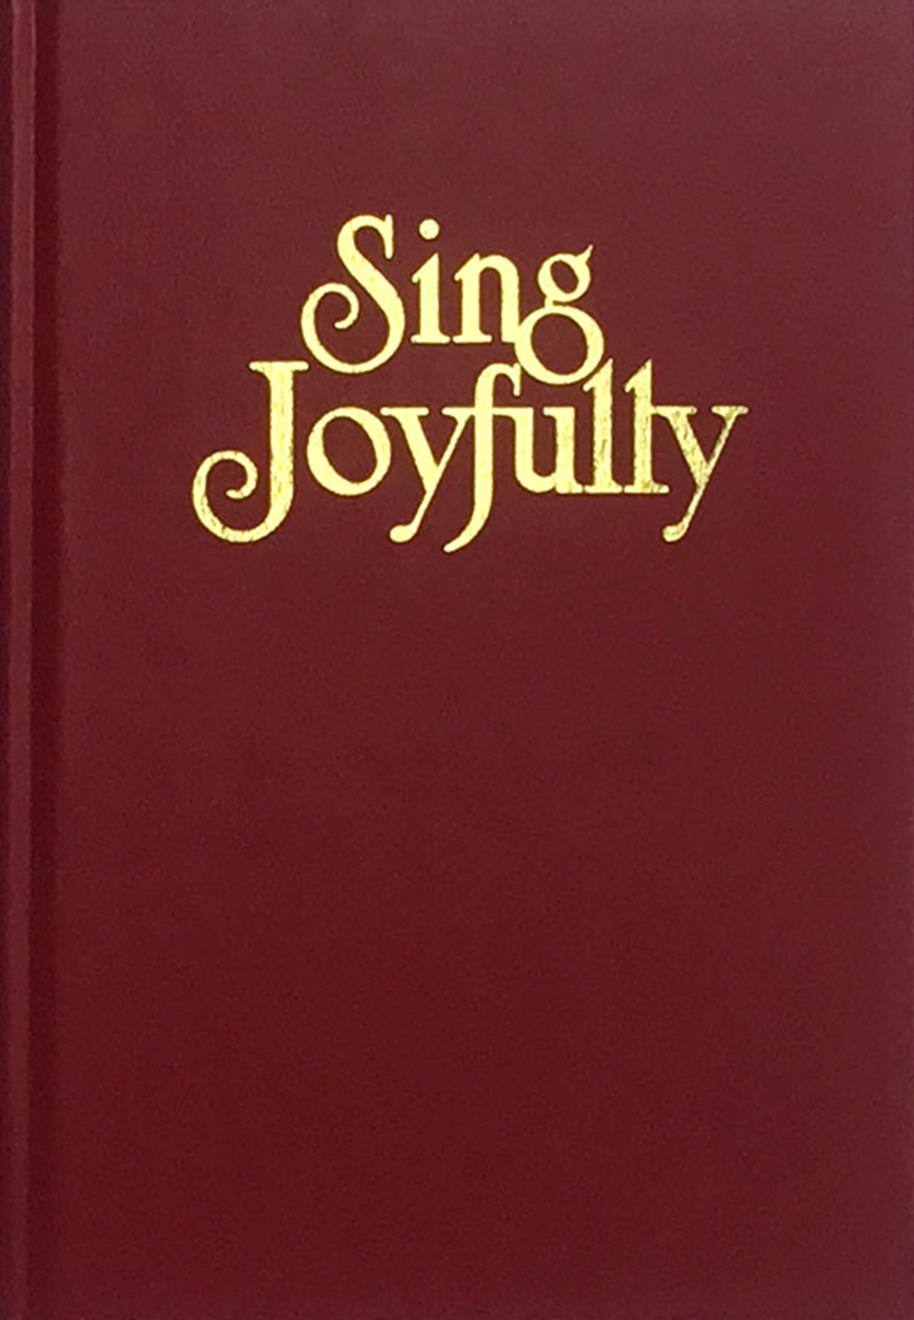 Sing Joyfully - Red Cover Image